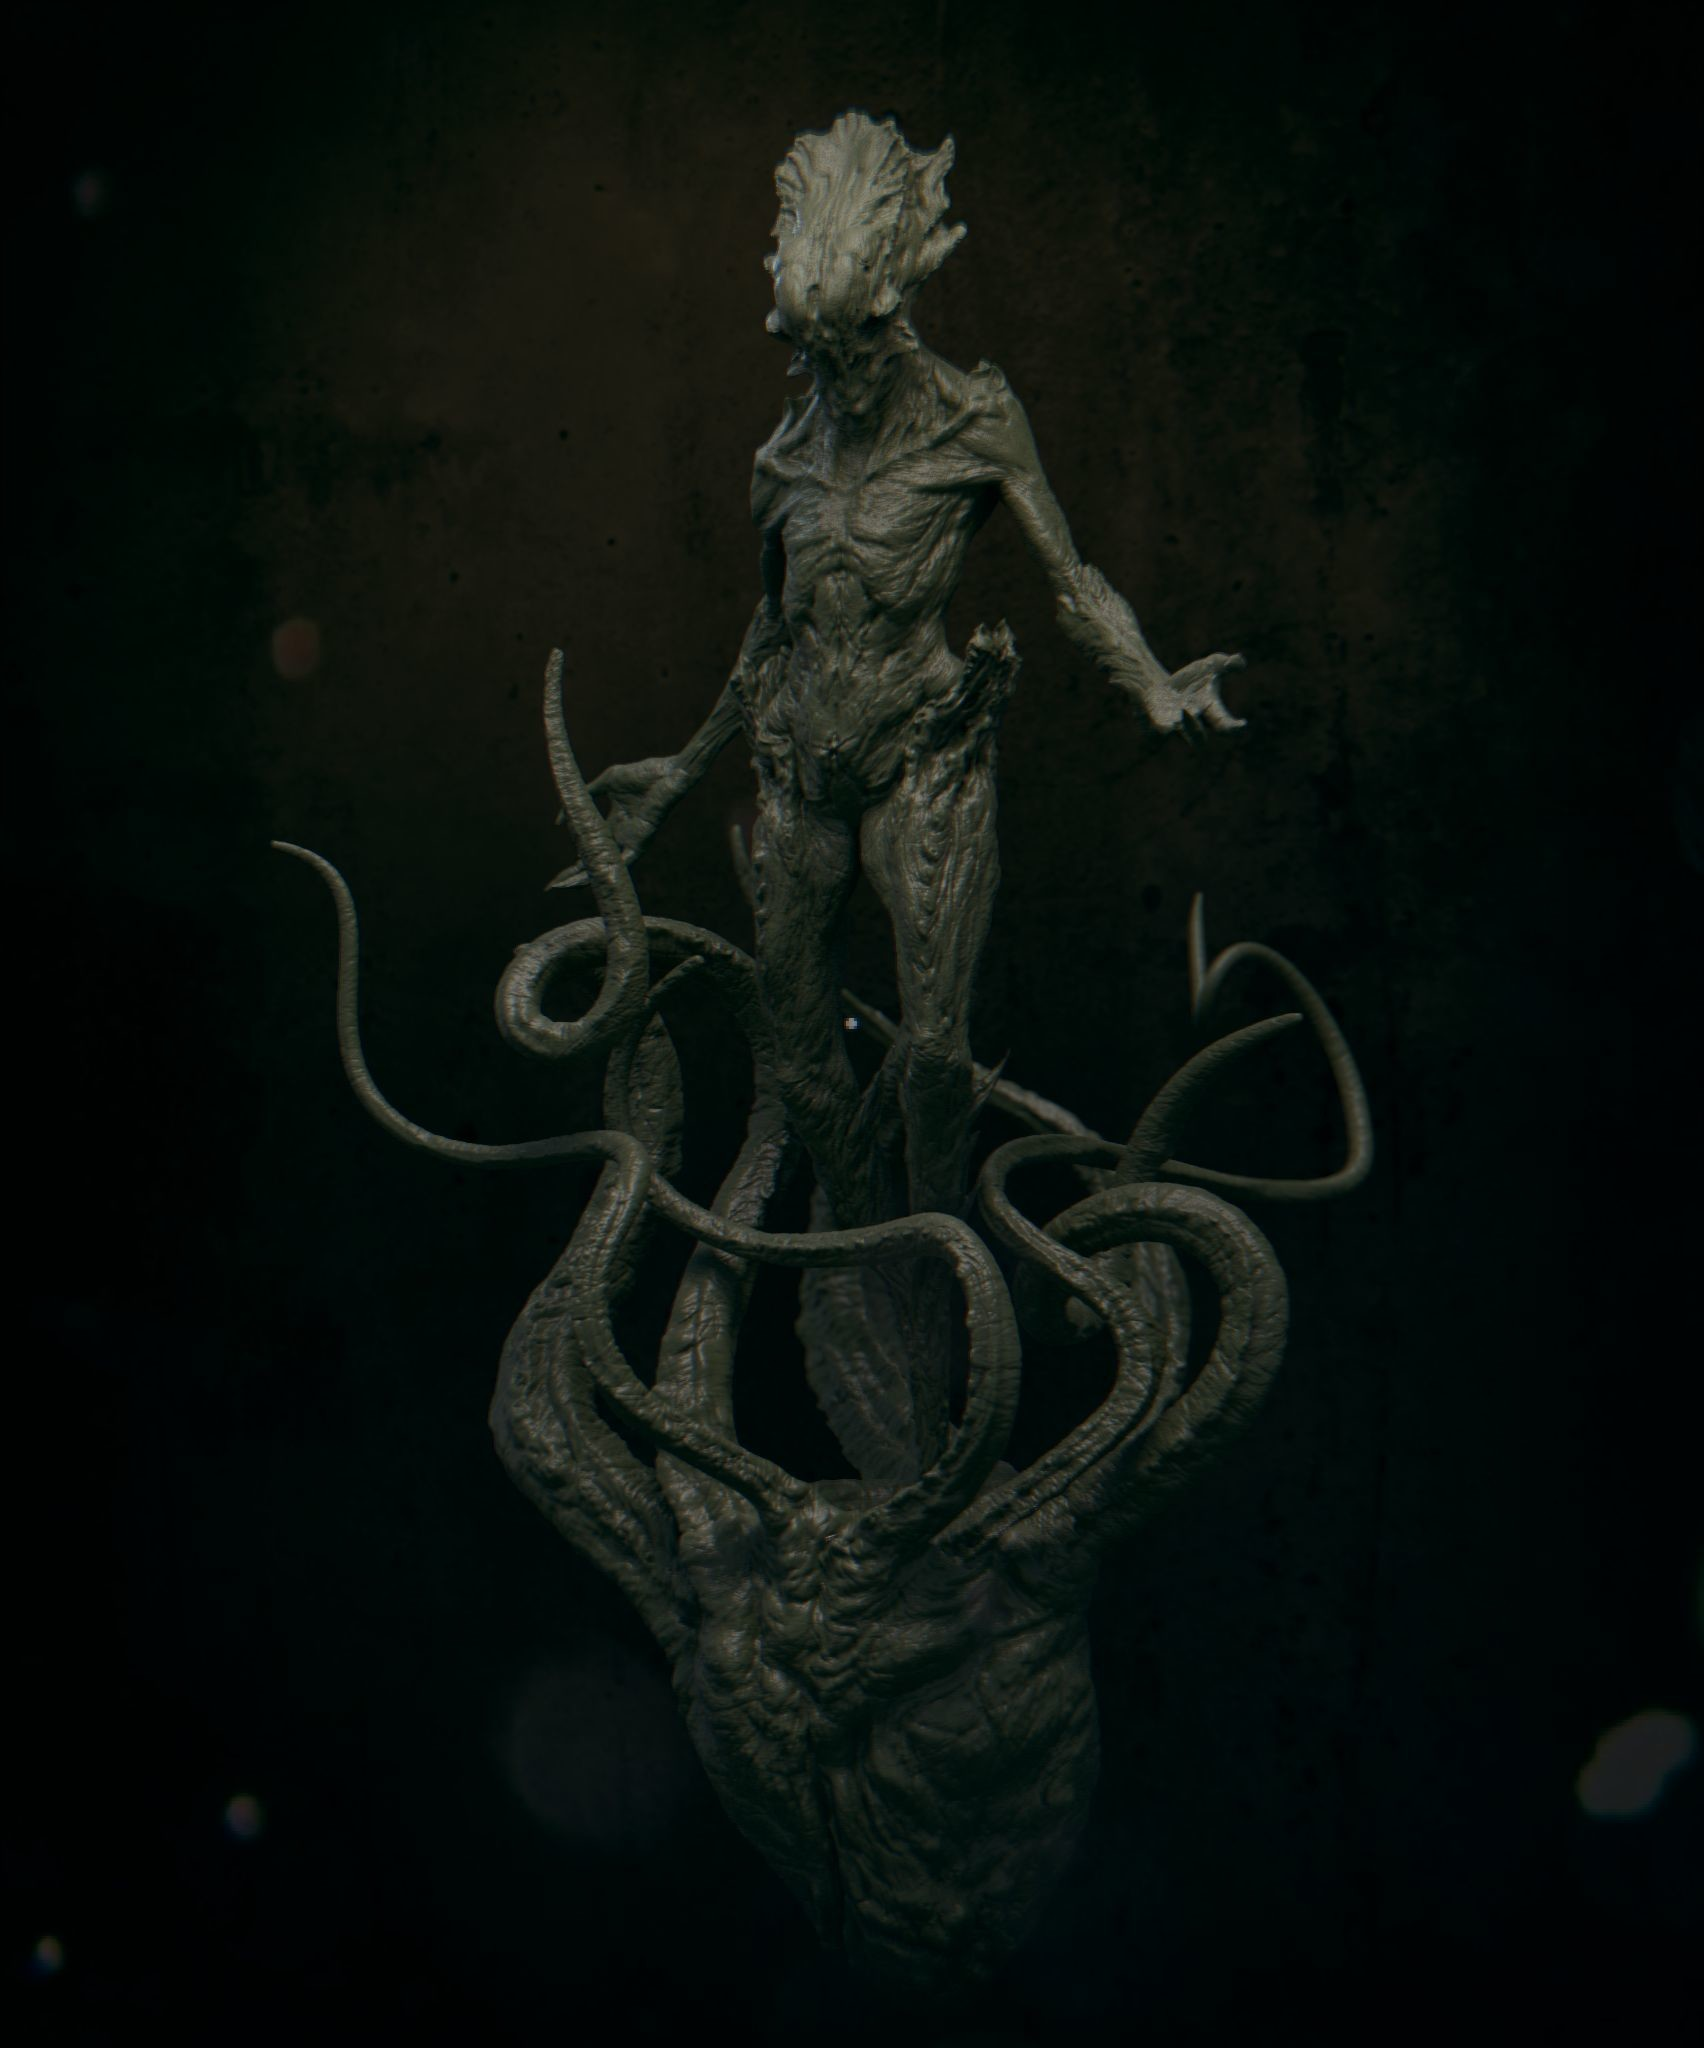 Daniel bystedt lovecraft monster 02